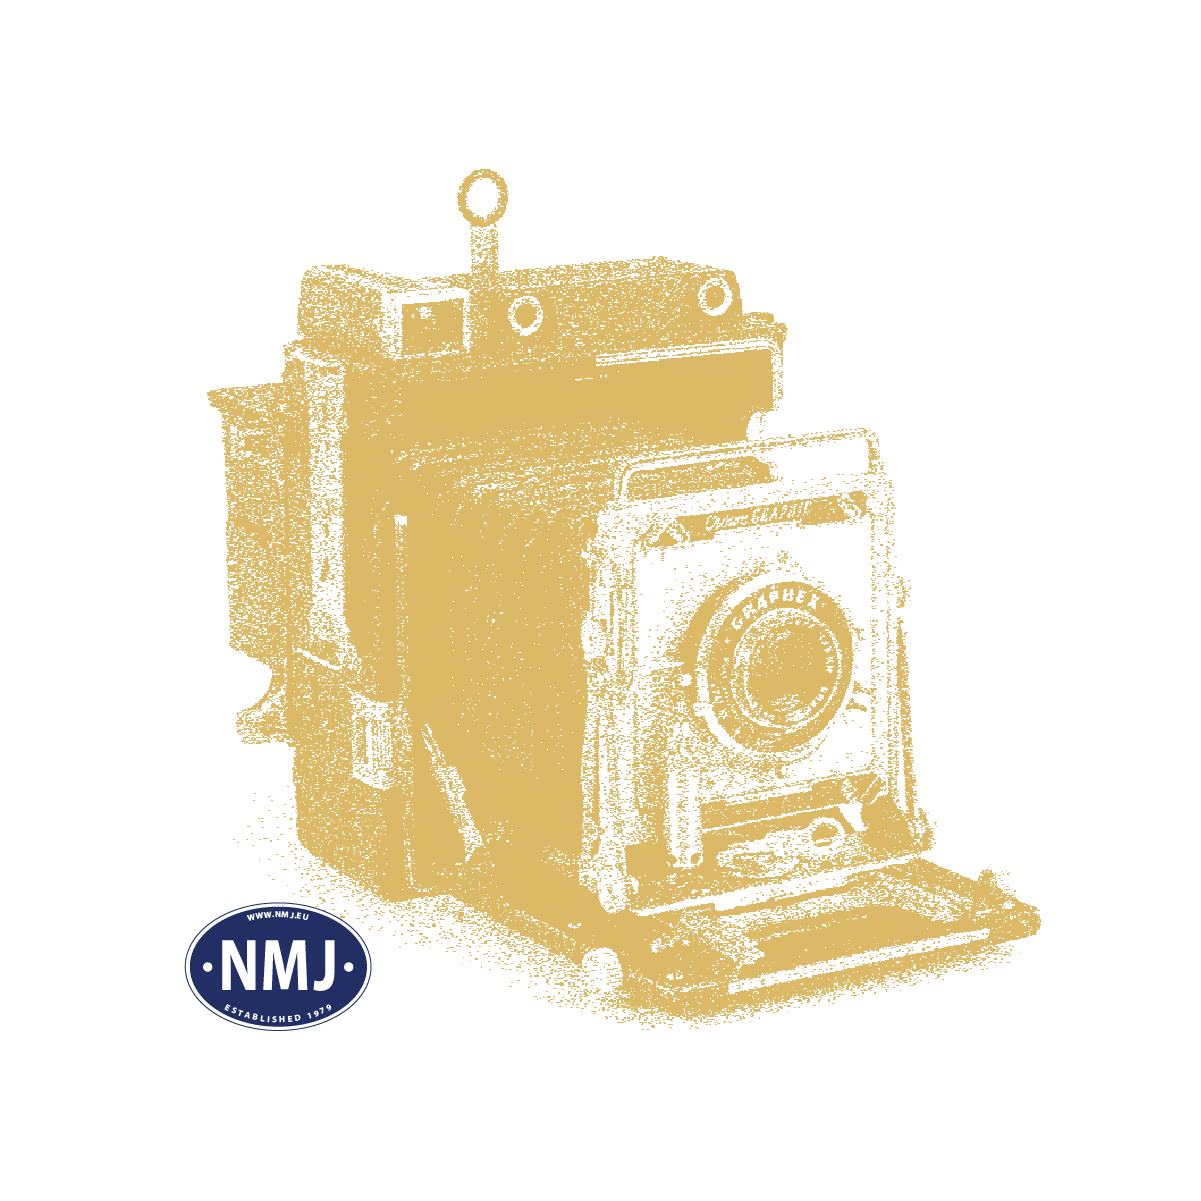 NMJS39.166 - NMJ Superline Modell der Schlepptenderlok Type39.166 der NSB